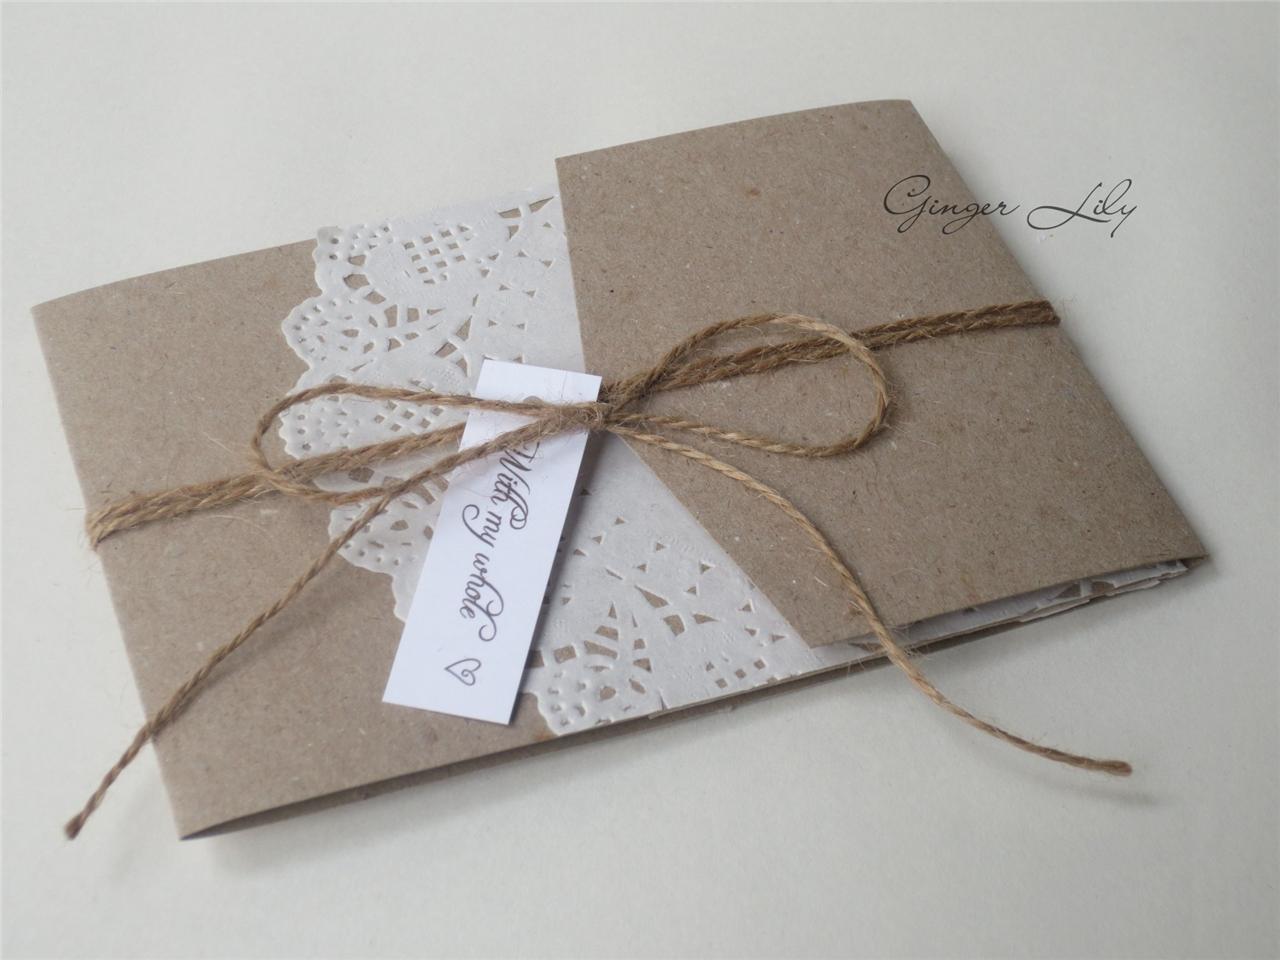 Diy Paper Wedding Invitation: DIY Pocket Invite Kit